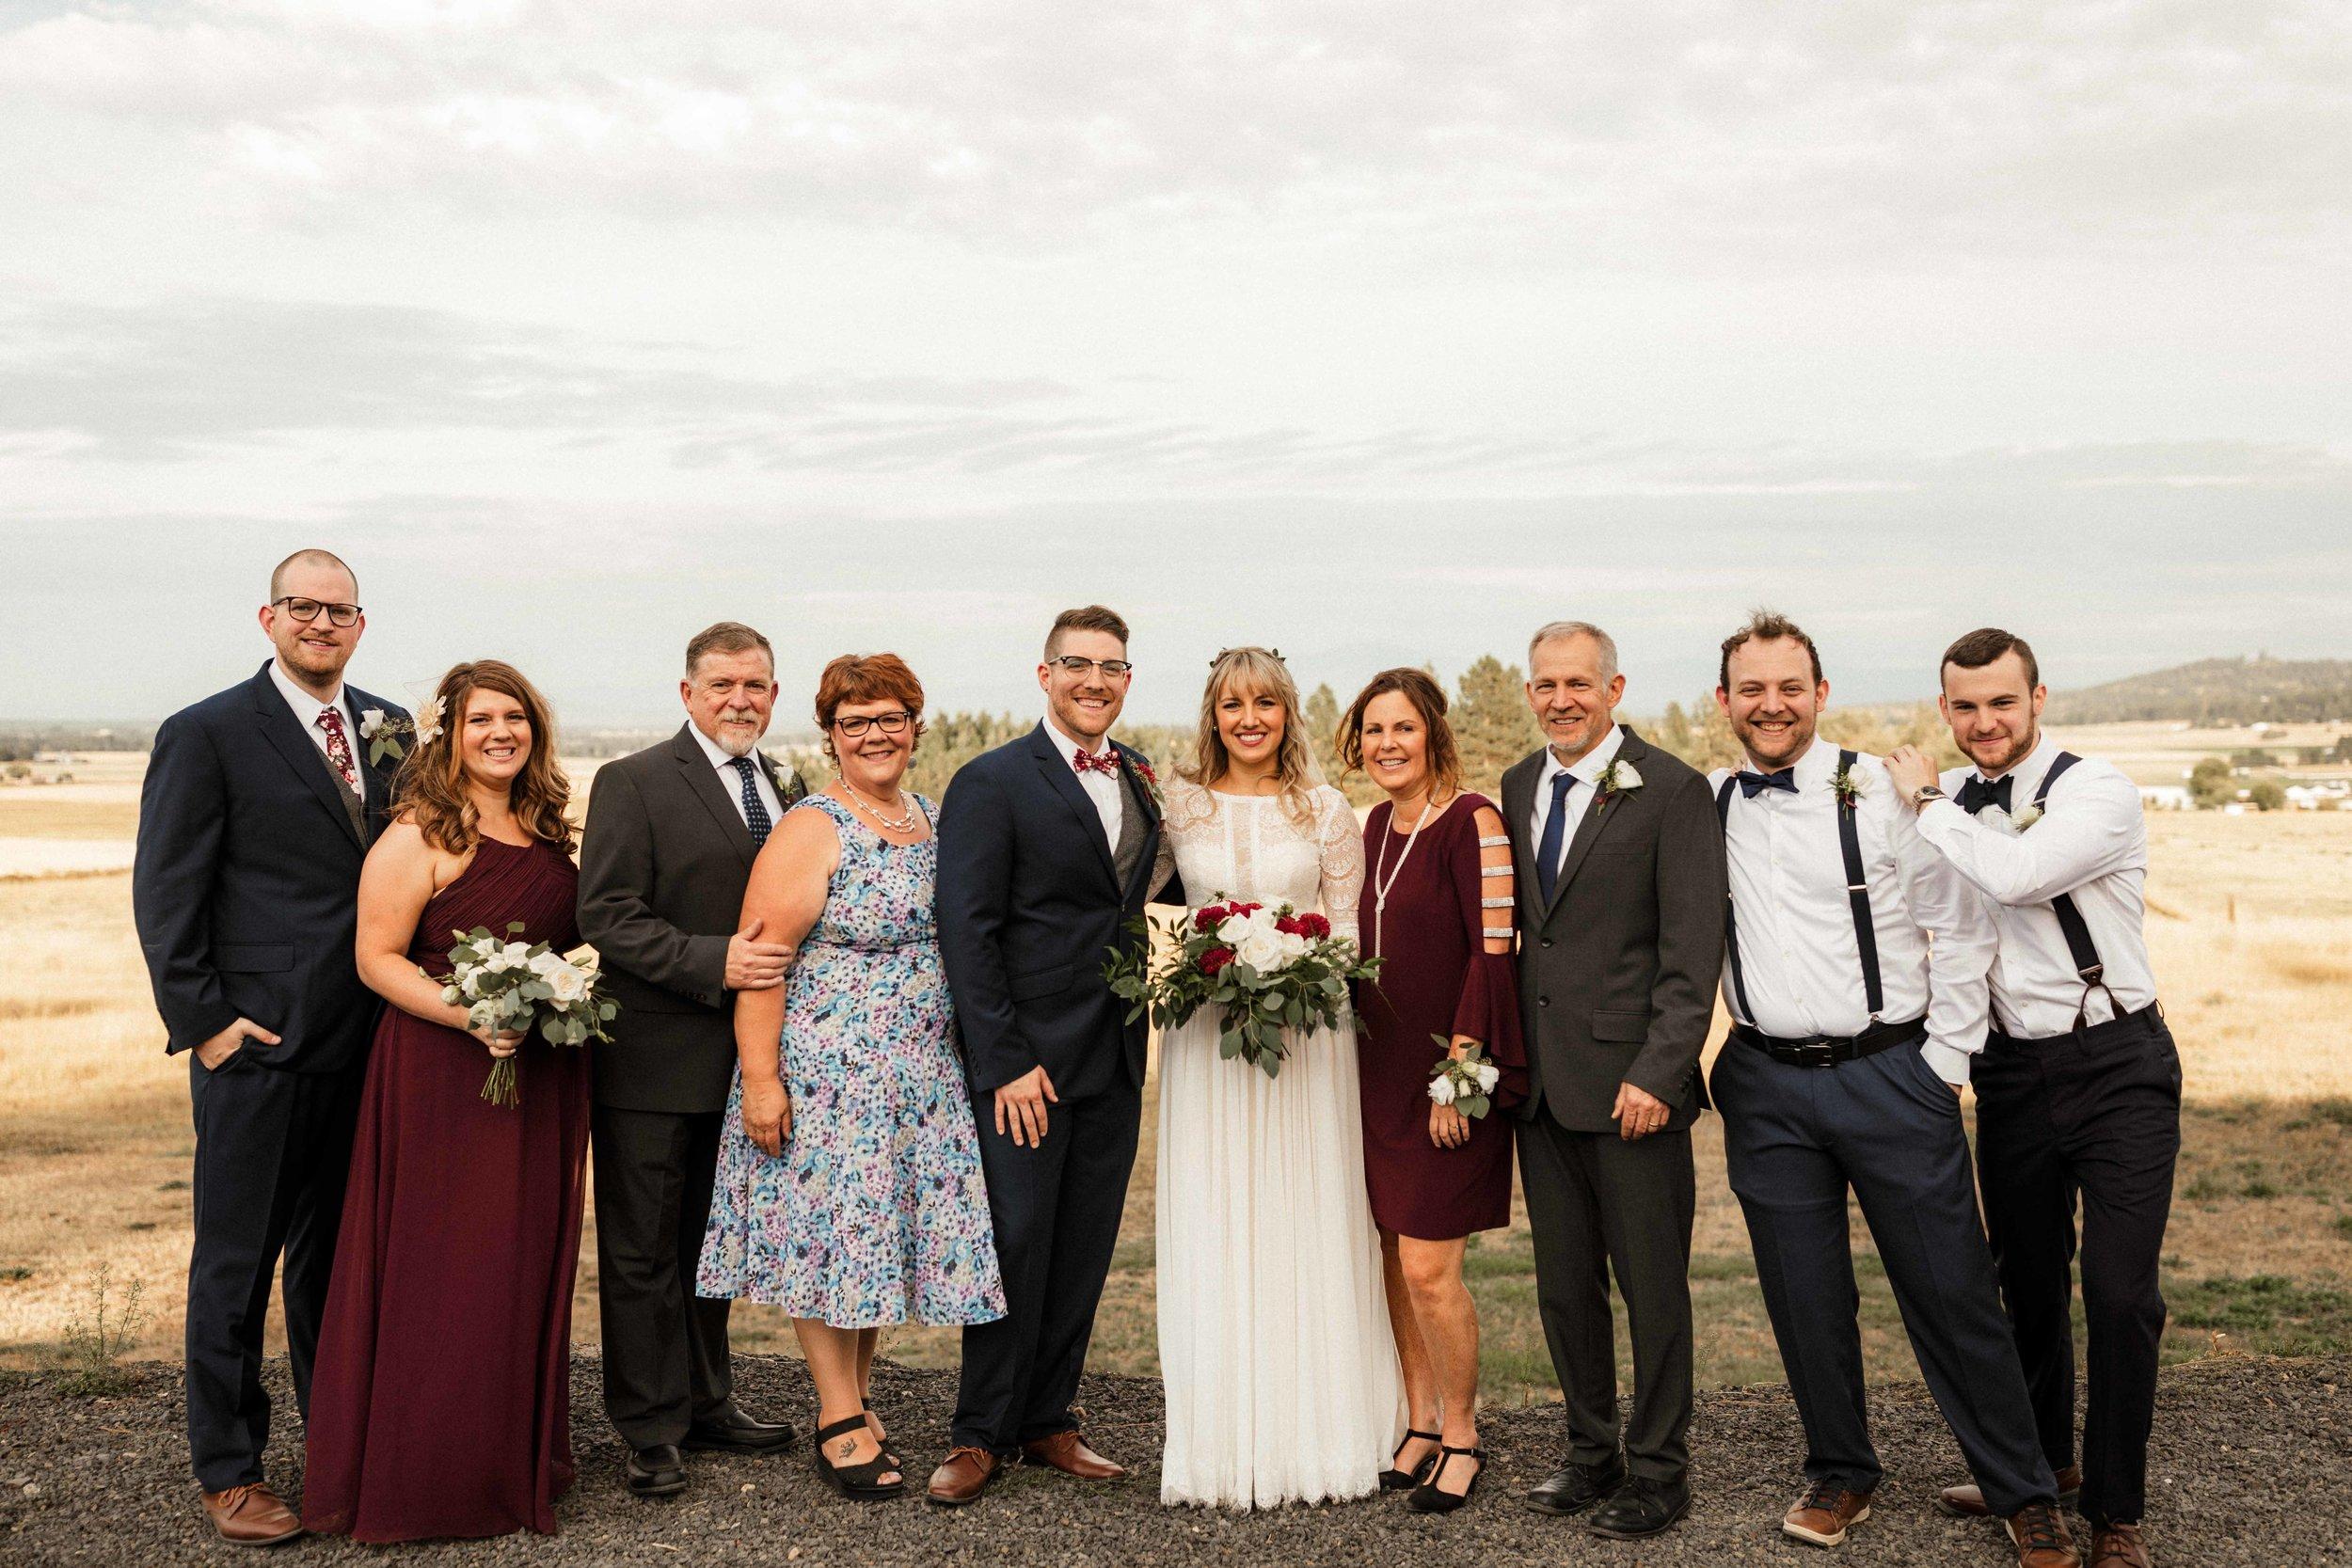 lavender-manor-wedding-79.jpg